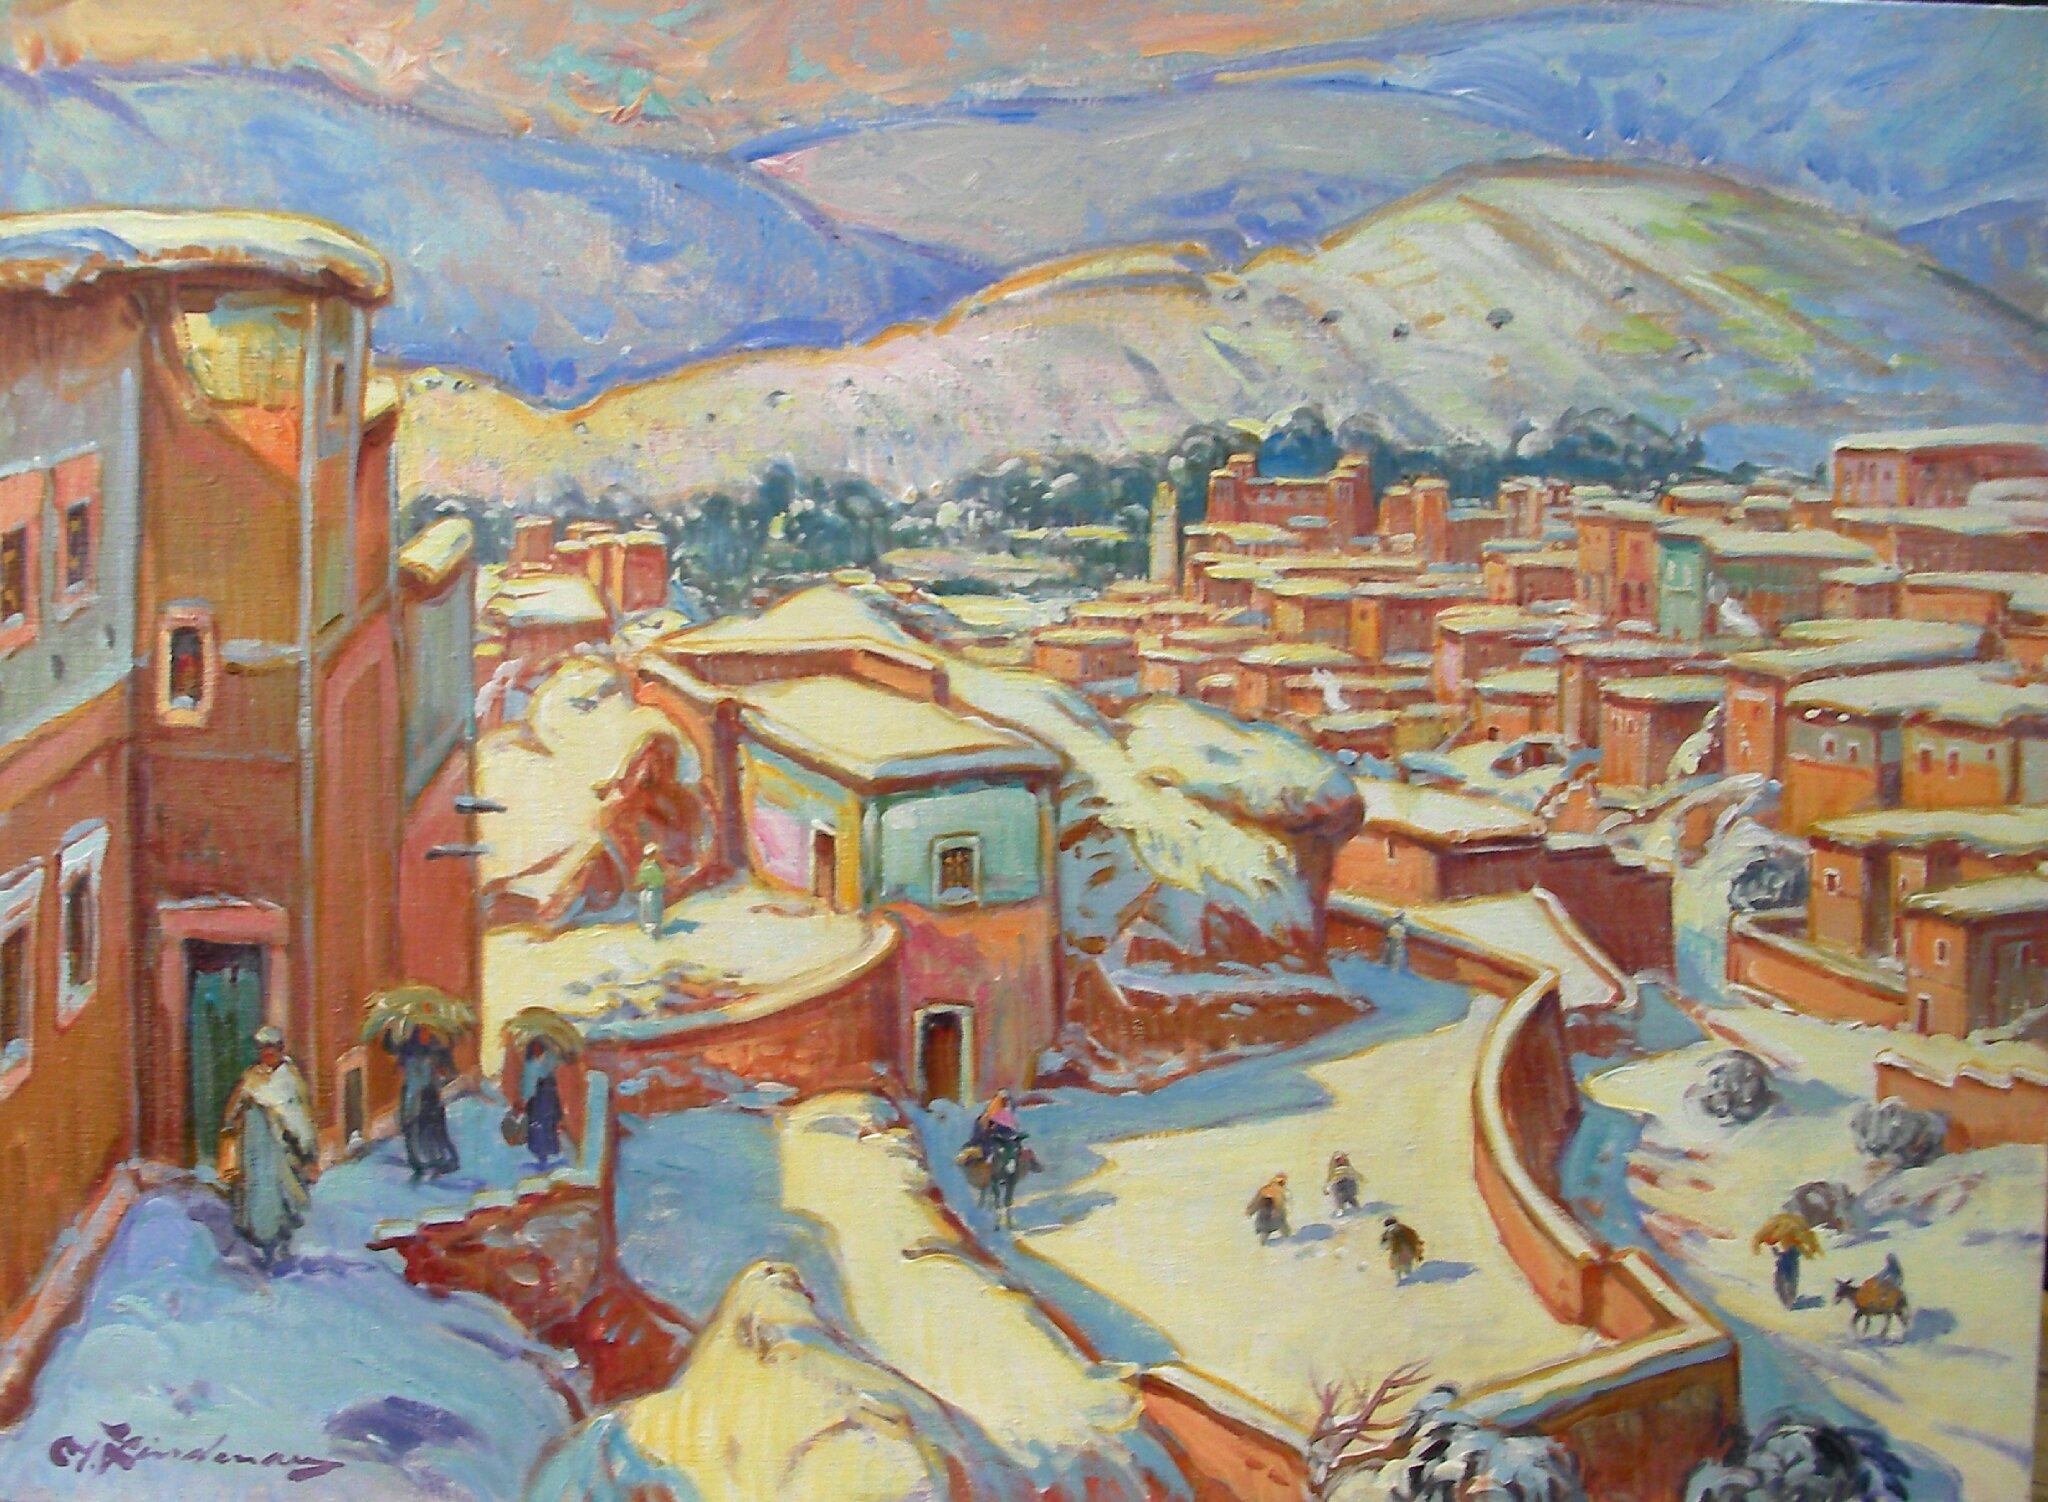 Cote Artiste Peintre Francais artiste peintre martin lindenau - vos artistes au maroc (www